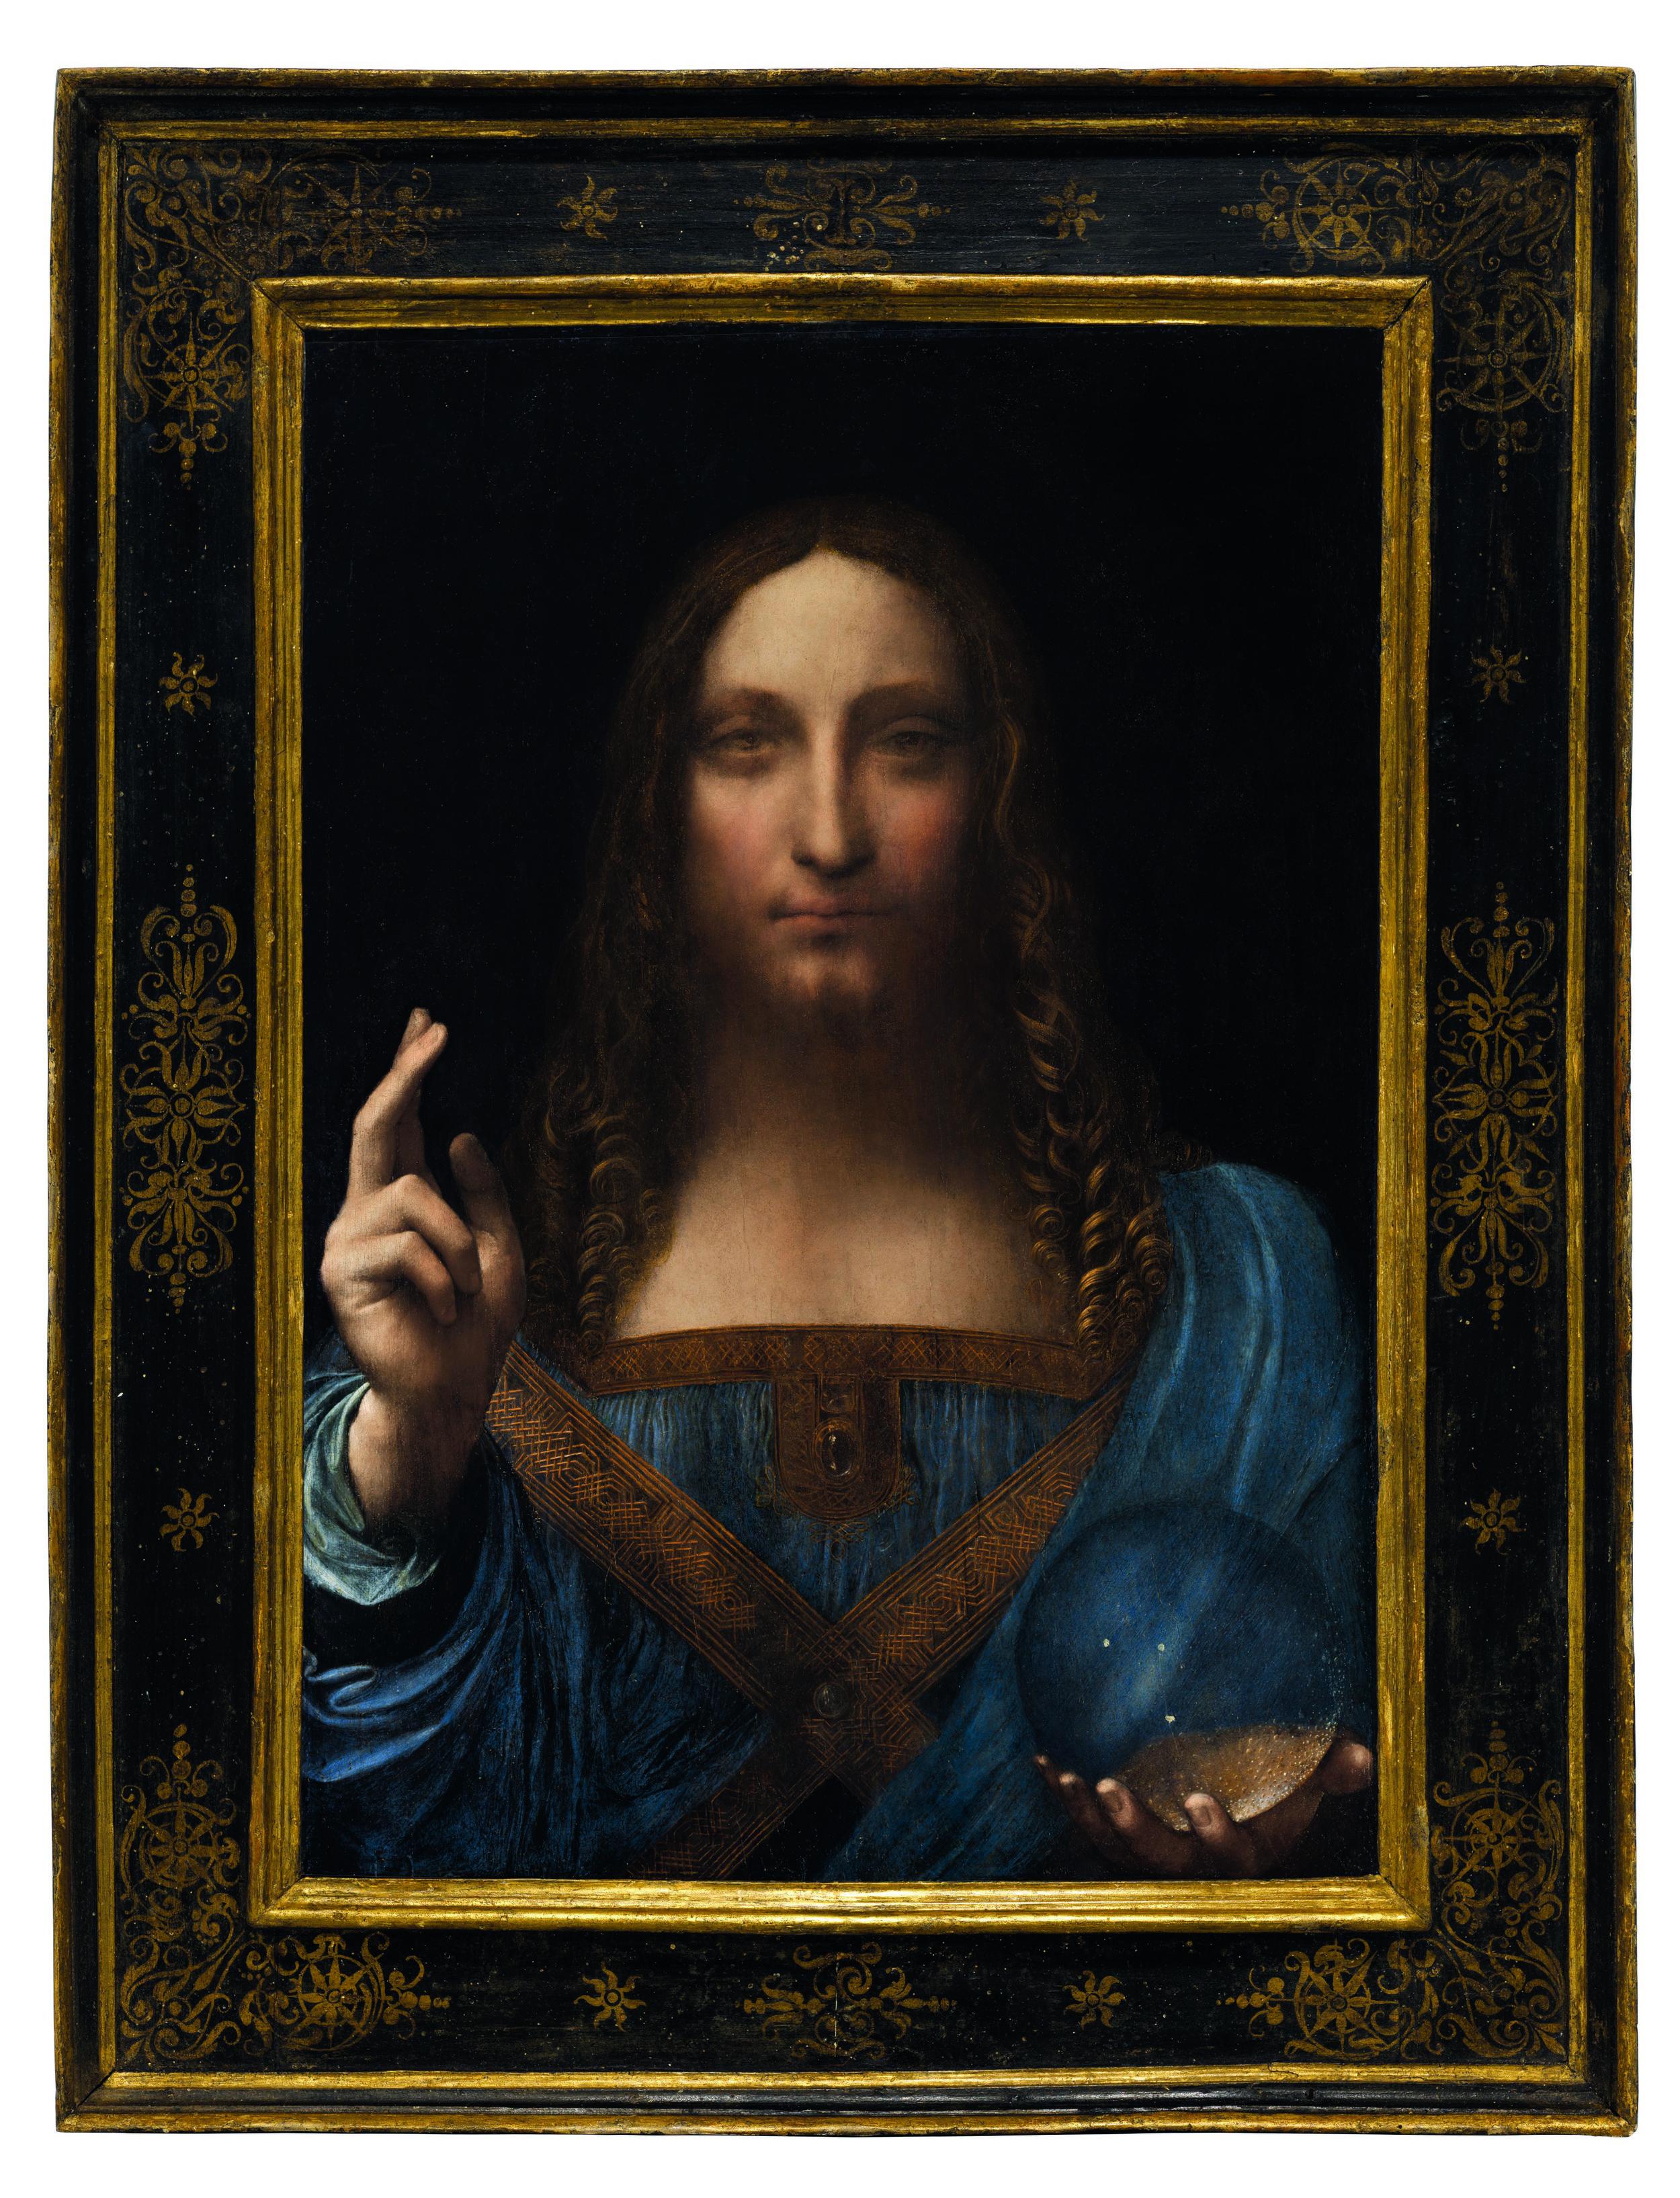 Leonardo da Vinci, Salvator Mundi (c.1500). Courtesy of CHRISTIE'S IMAGES LTD. 2018.